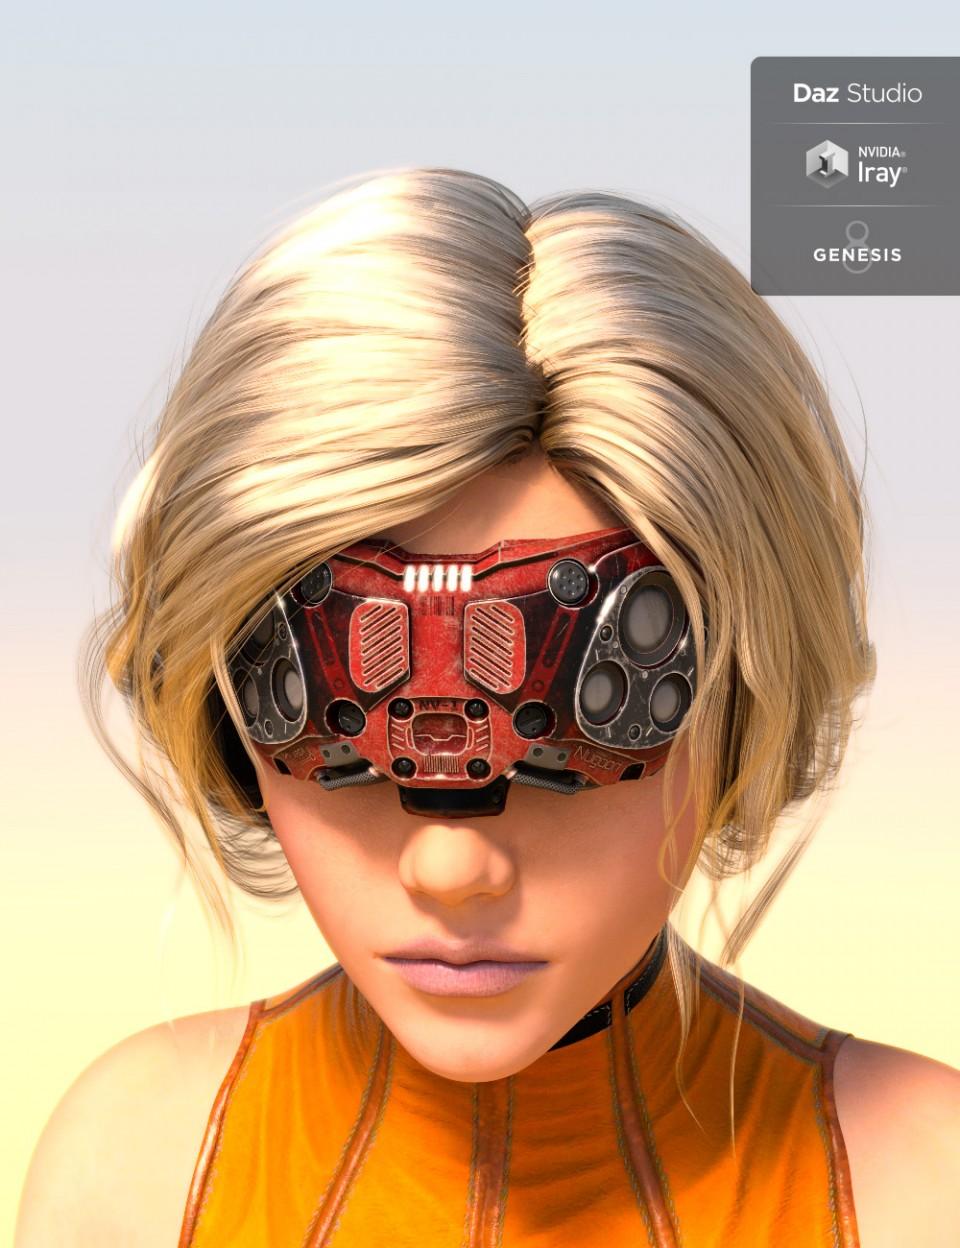 Nugoori Goggles for Genesis 8_DAZ3D下载站